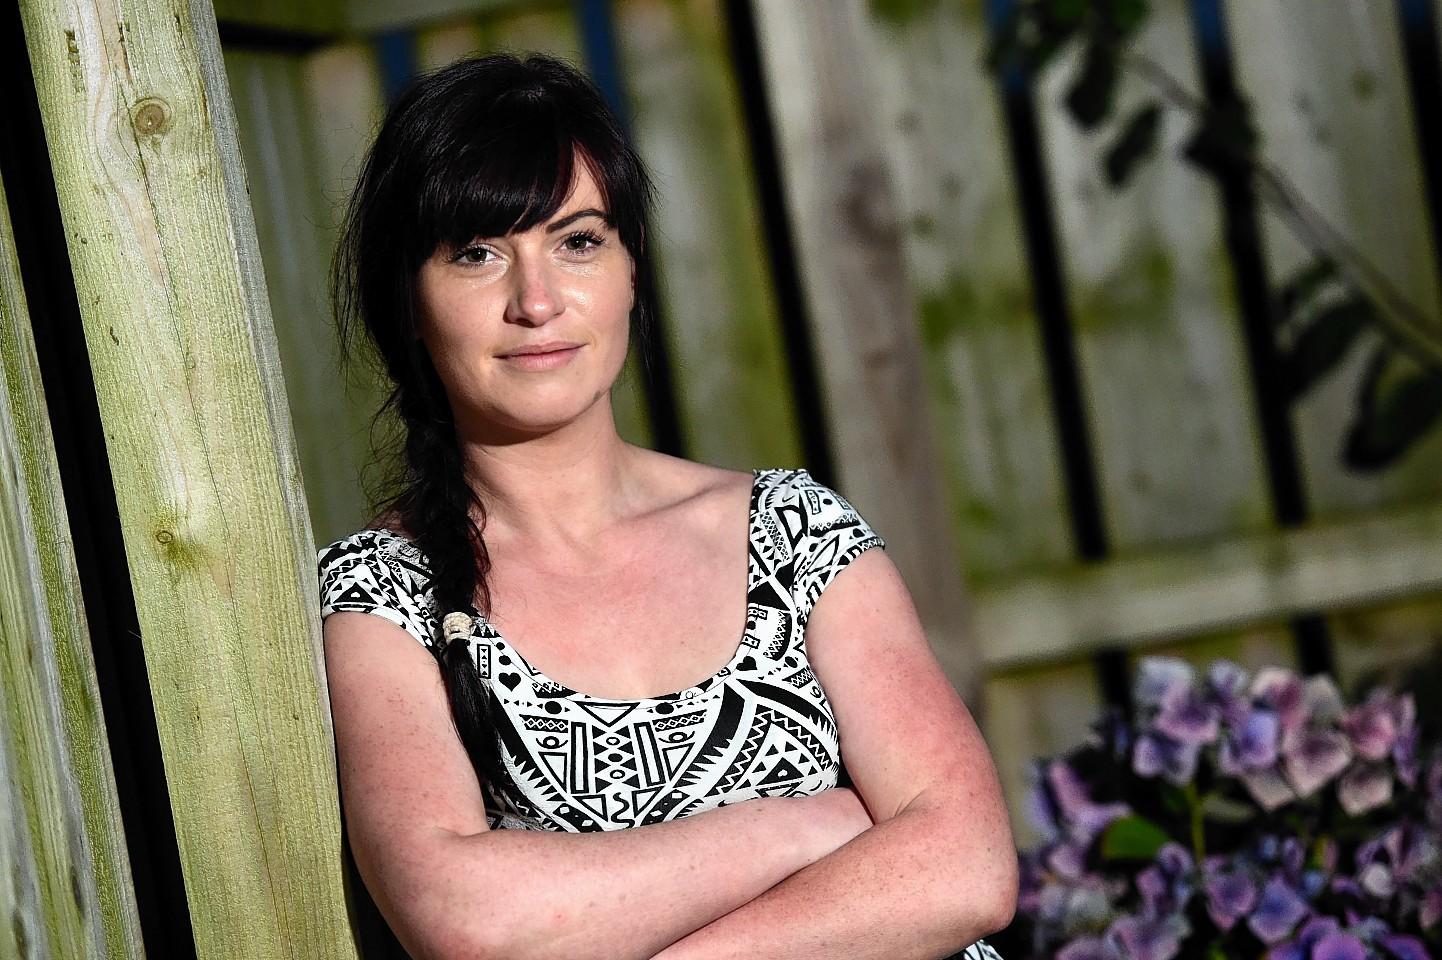 Gillian MacGregor has spoken out